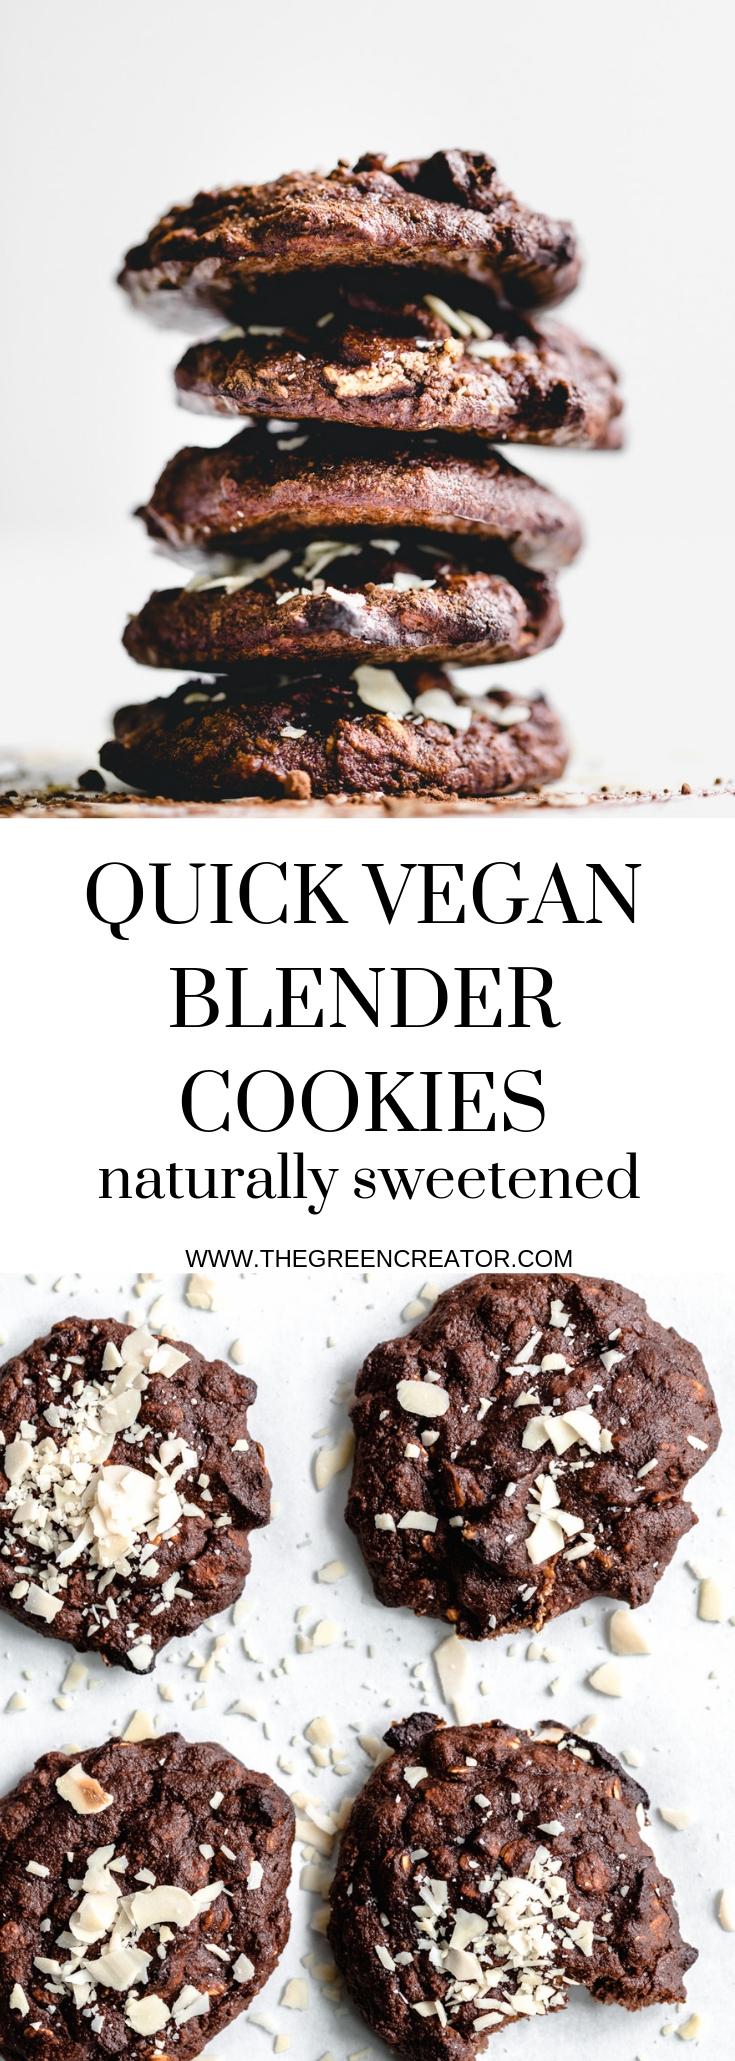 Quick Blender Chocolate Cookies